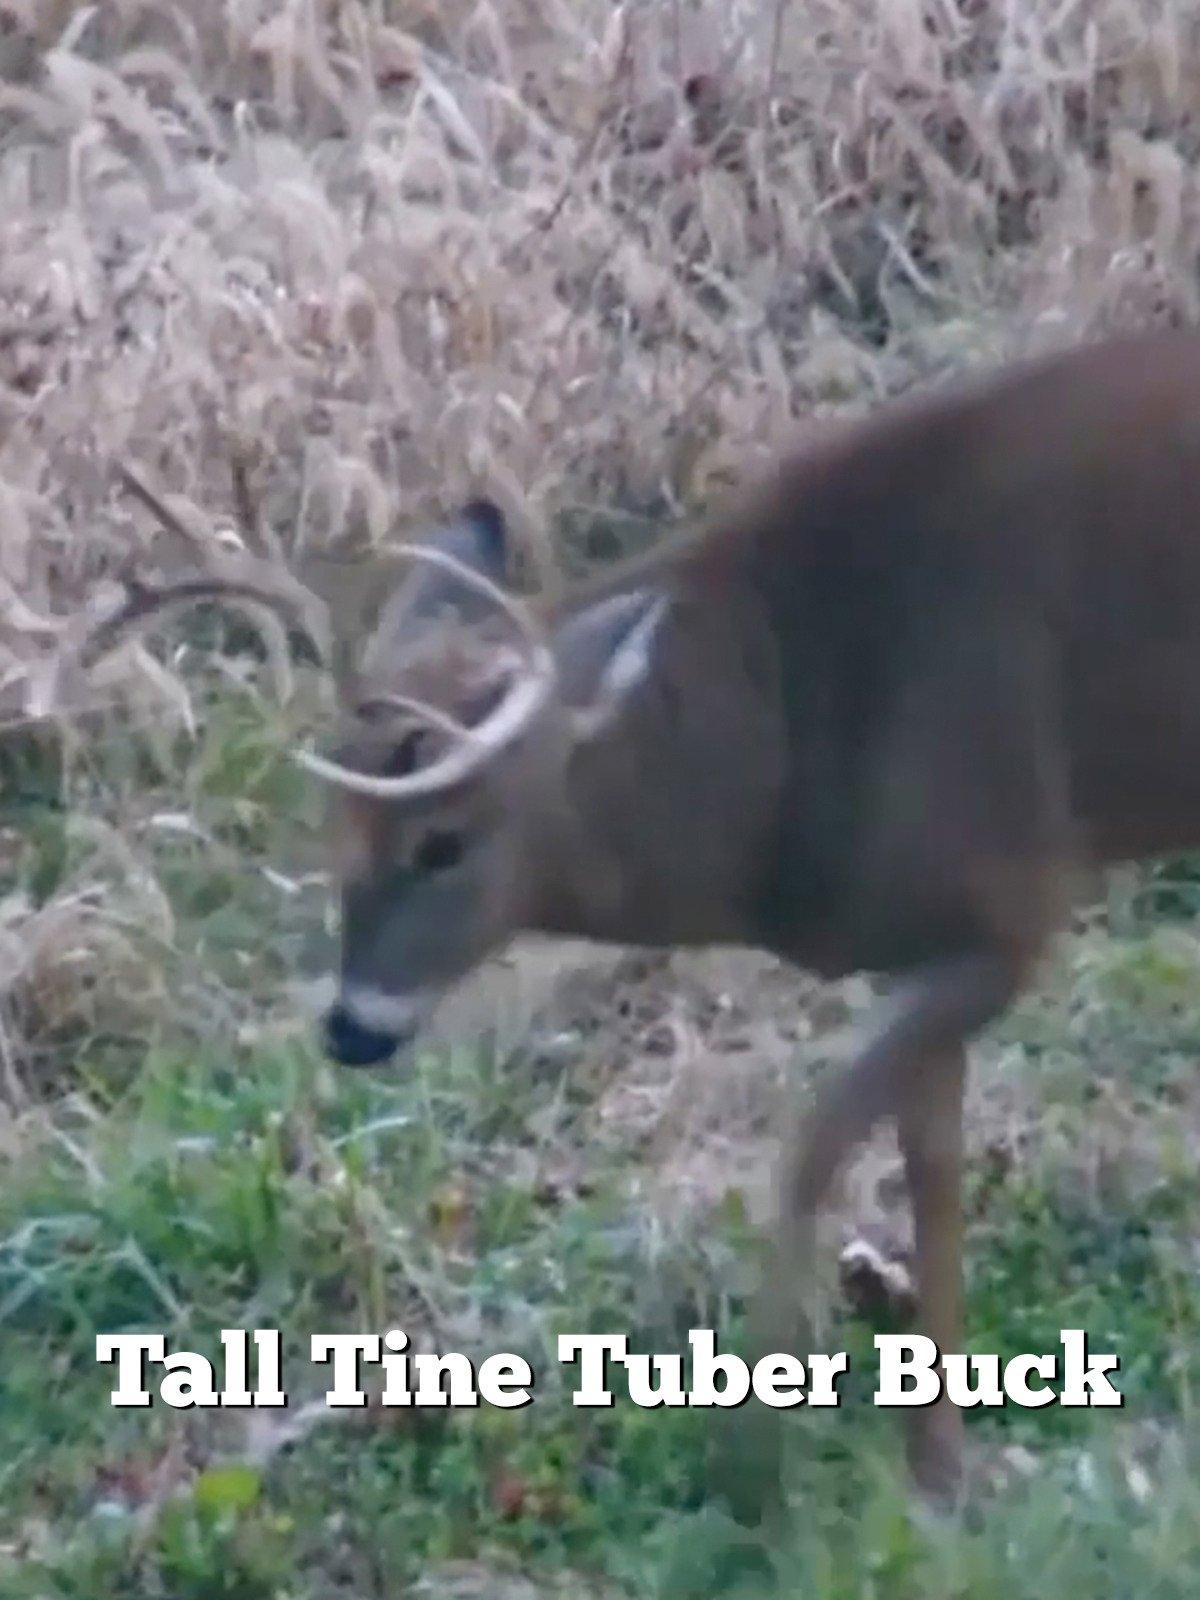 Tall Tine Tuber Buck